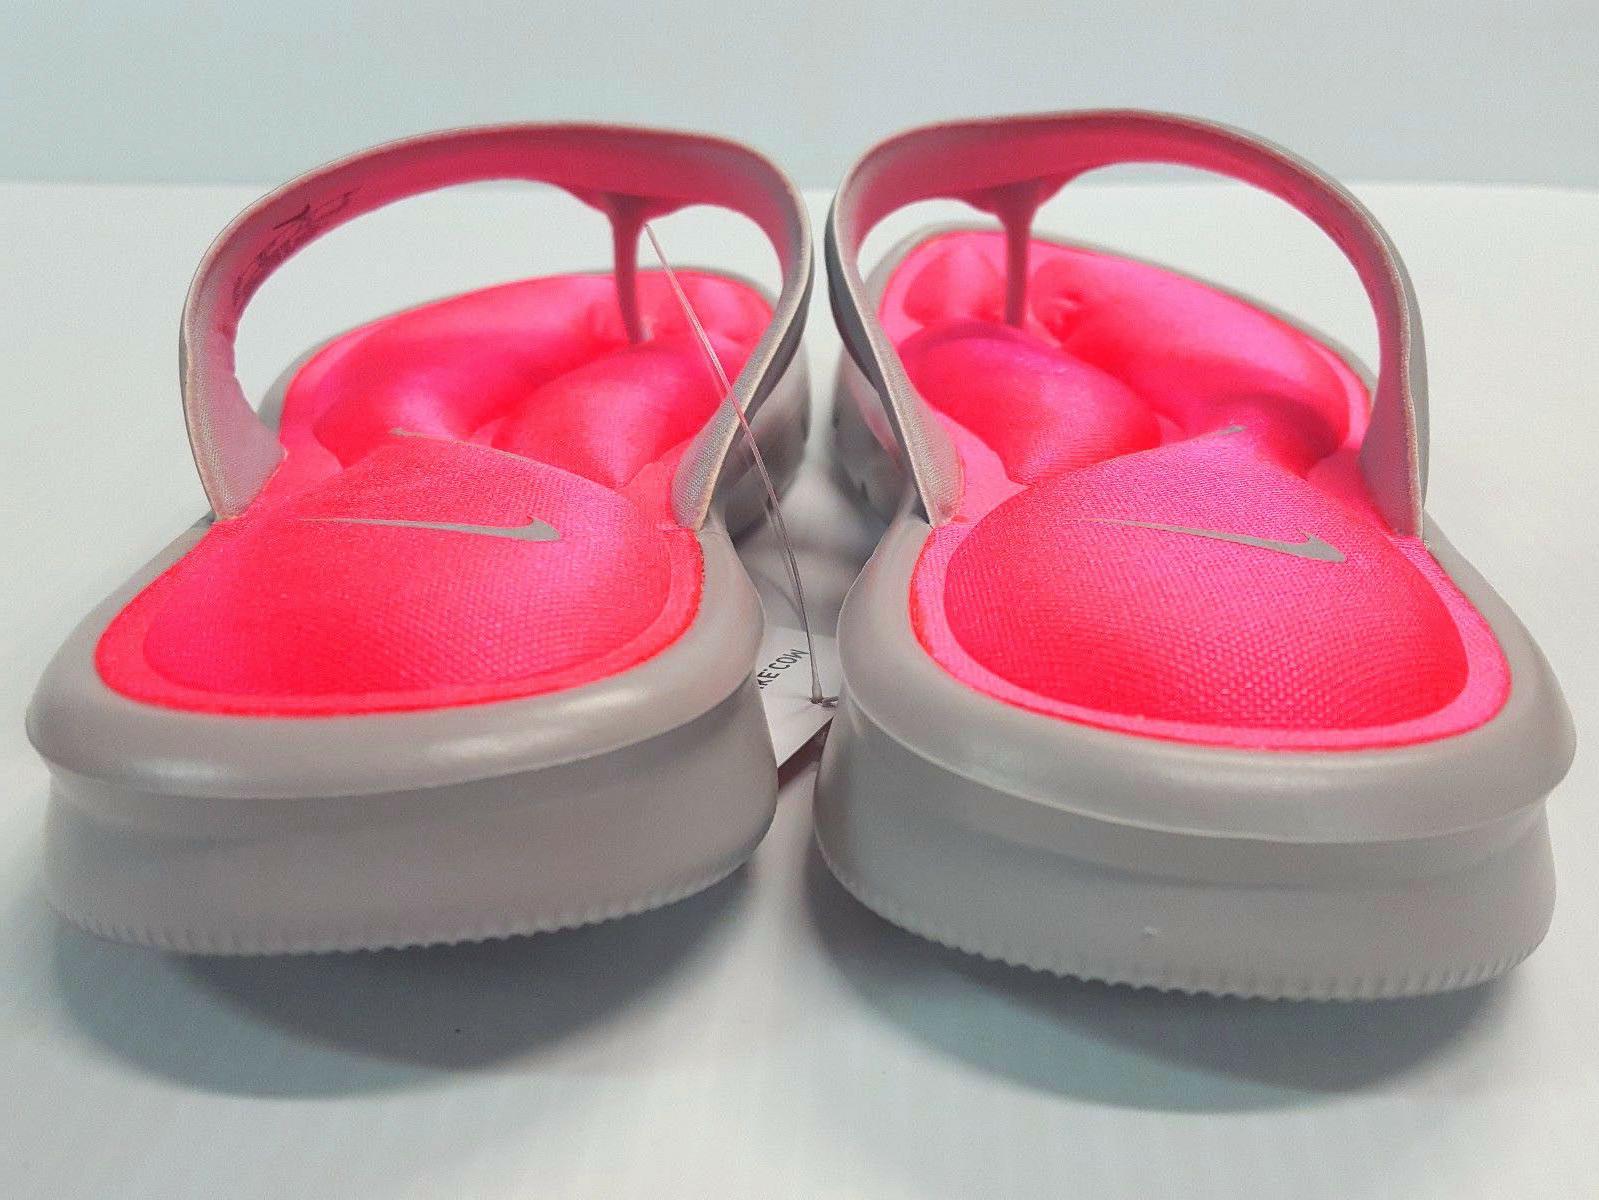 Nike Ultra Comfort Thong Sandals, Flip-Flops Gray/Punch Size 6,7,8,9,10